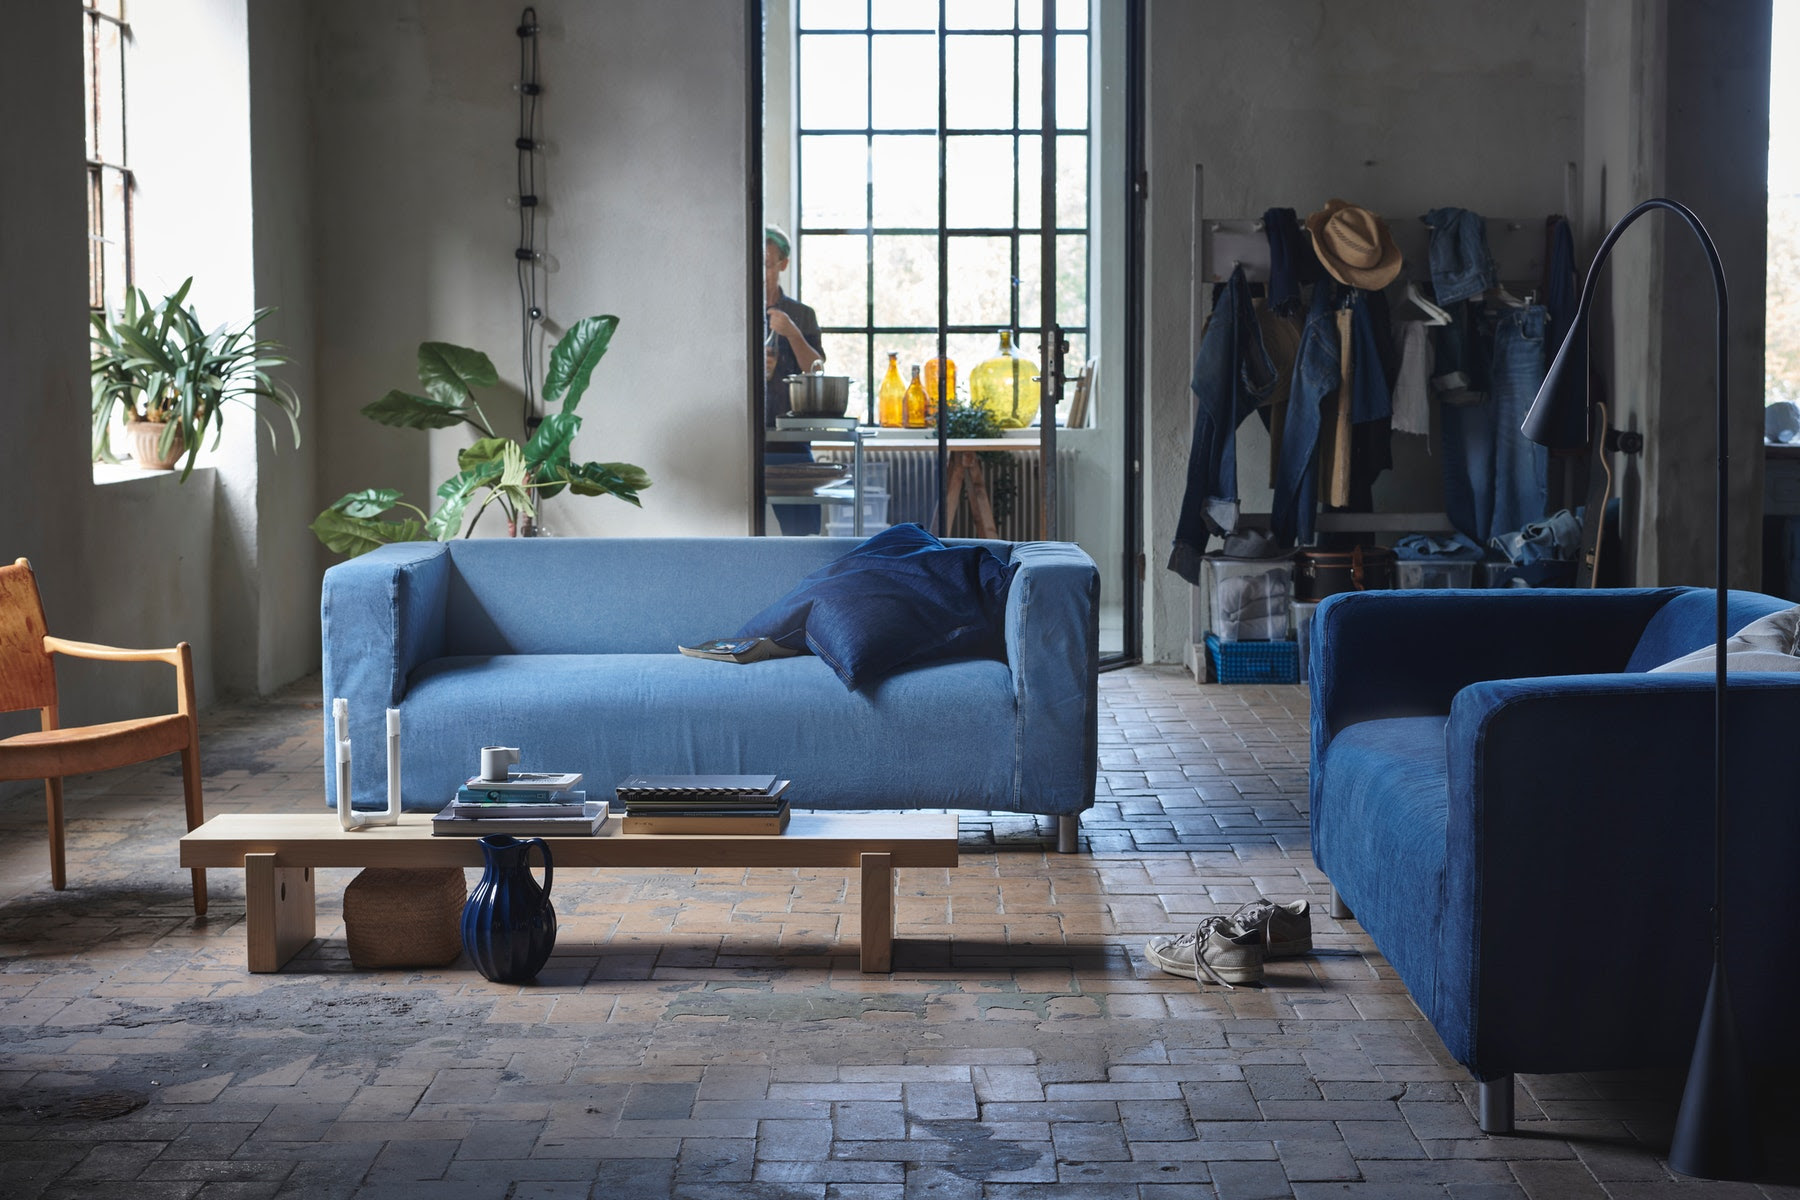 Ikea Klippan.jpg